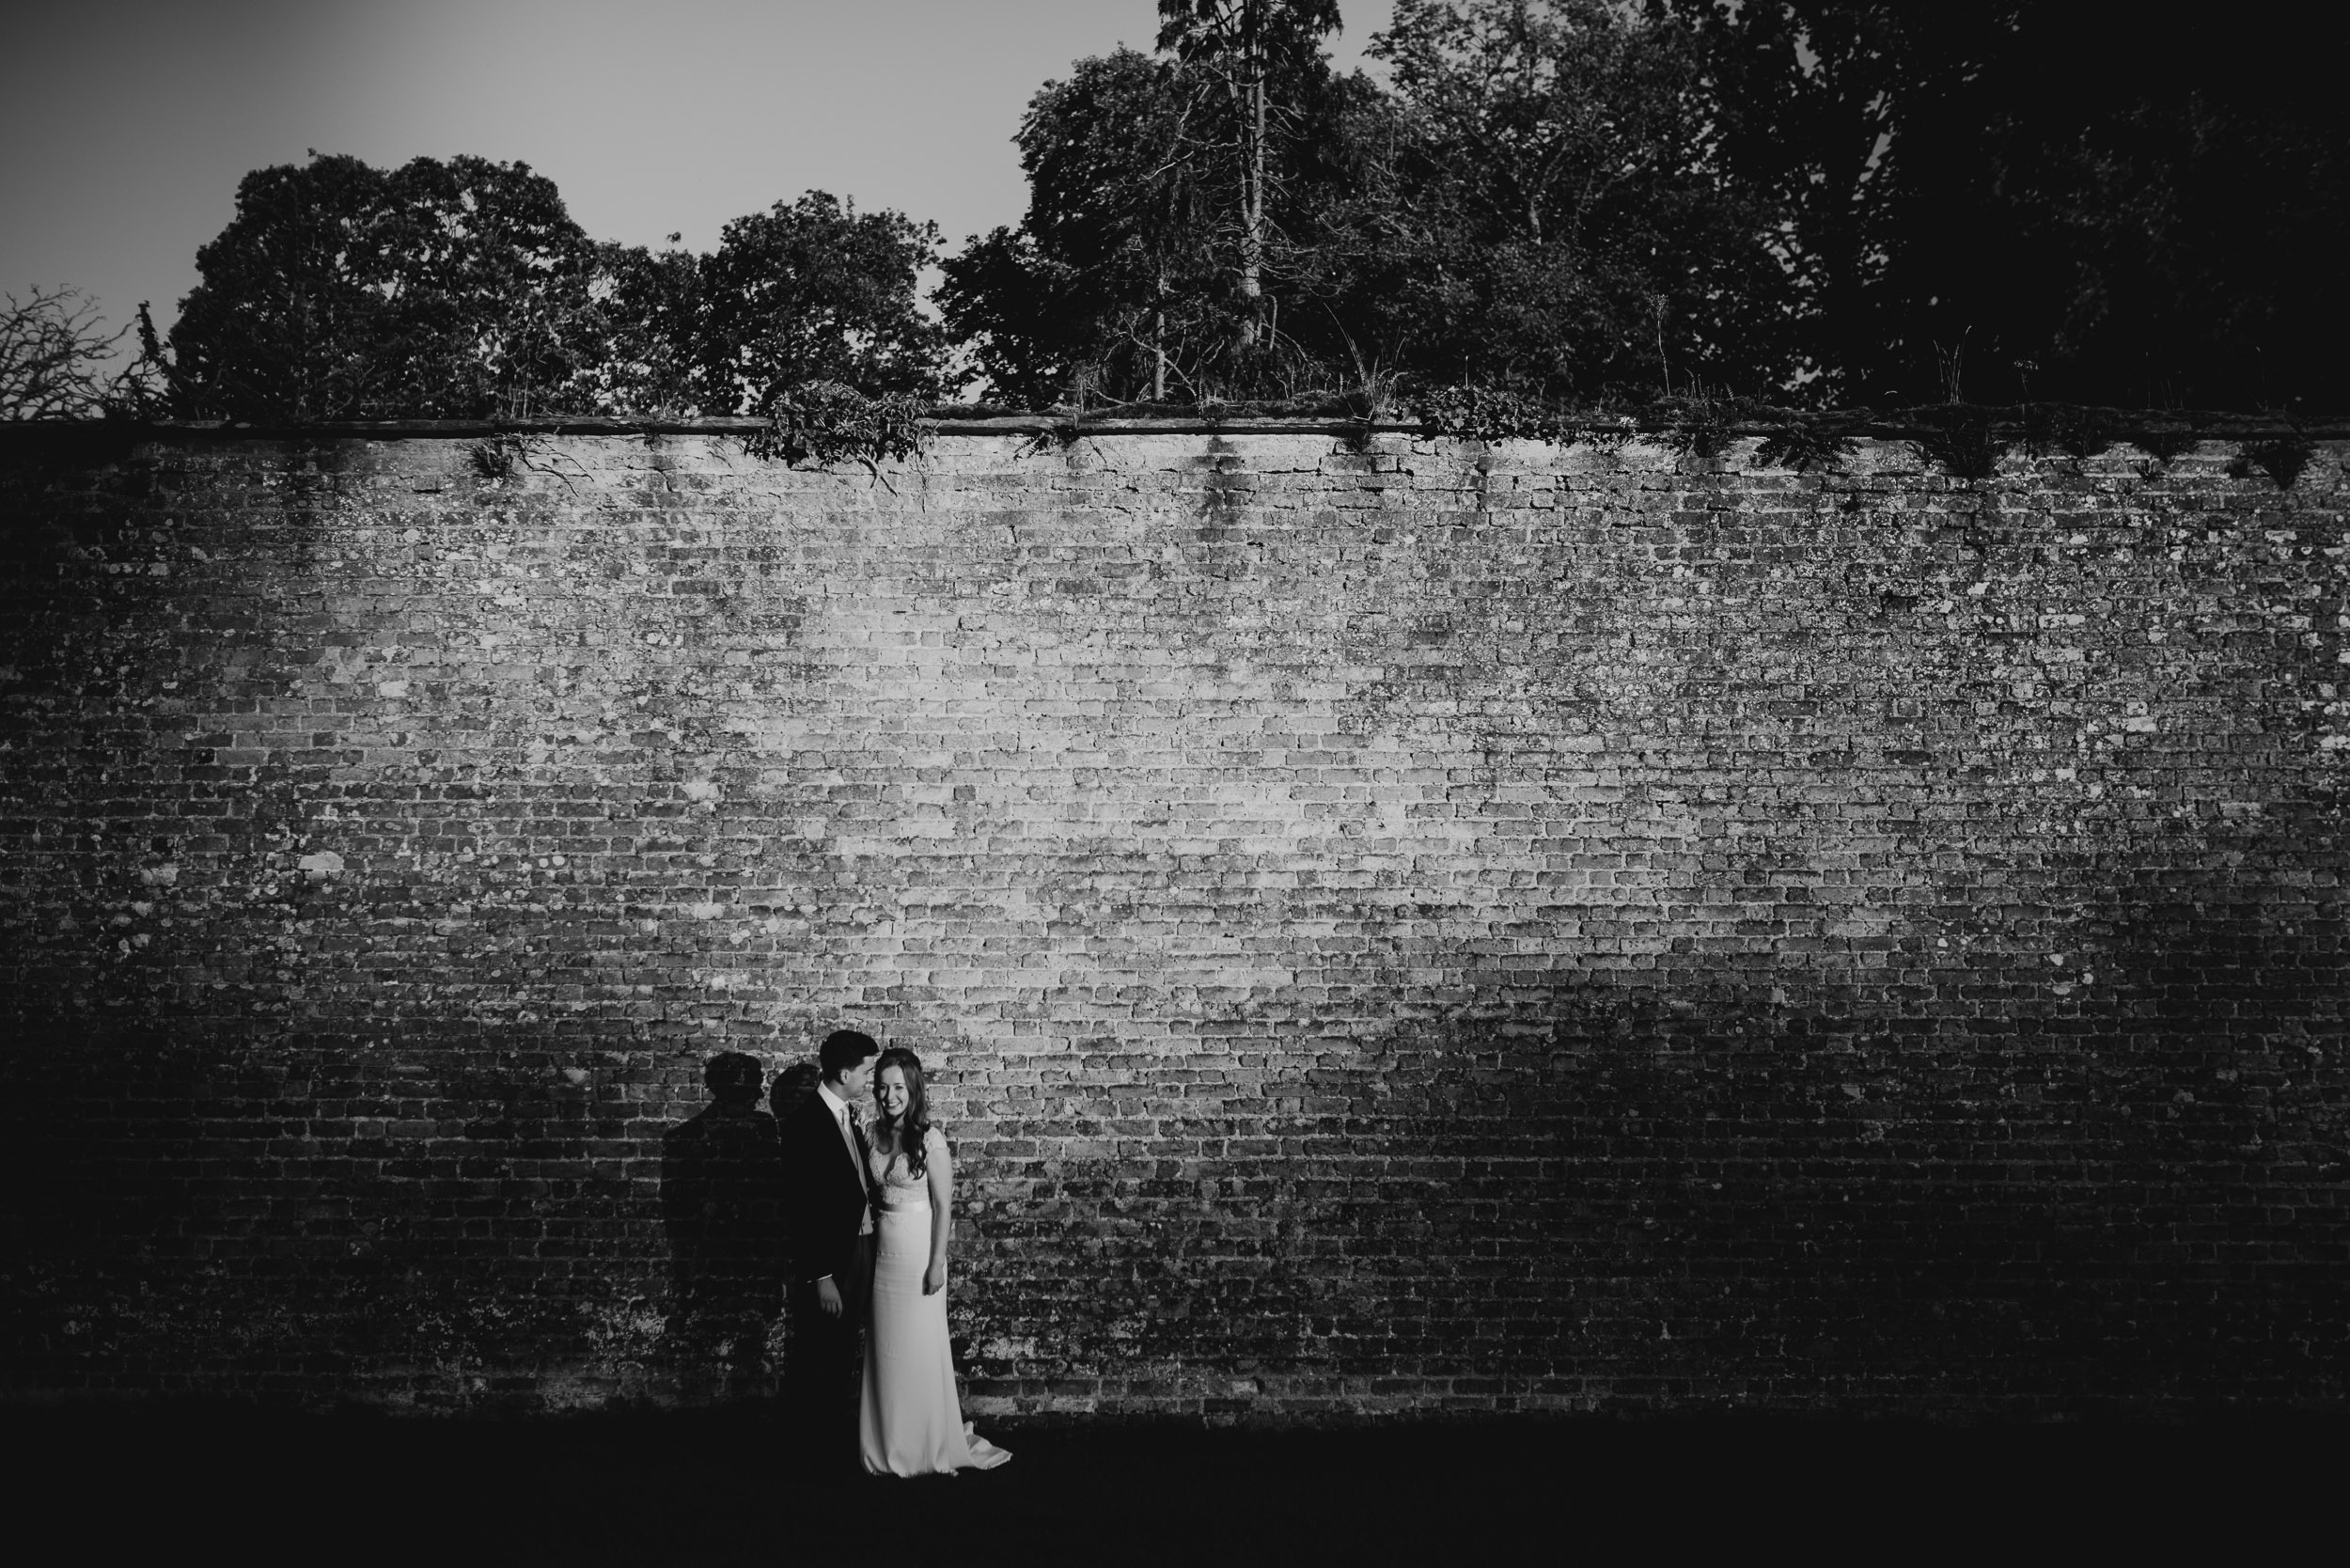 drenagh estate wedding photography-122.jpg